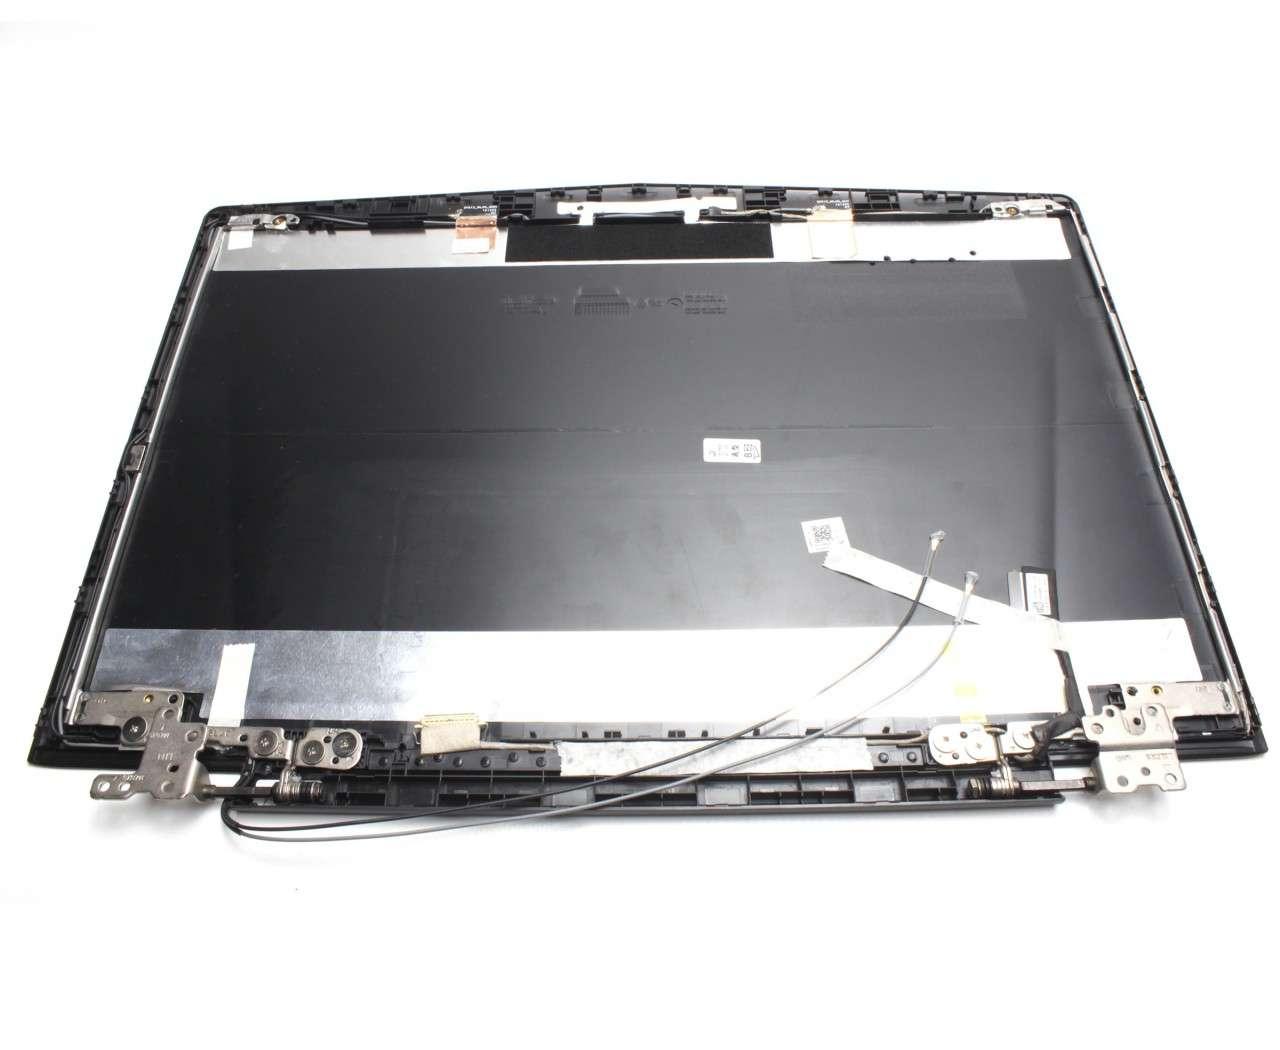 Capac Display BackCover Lenovo Legion Y520-15IKBN Carcasa Display cu Balamale imagine powerlaptop.ro 2021